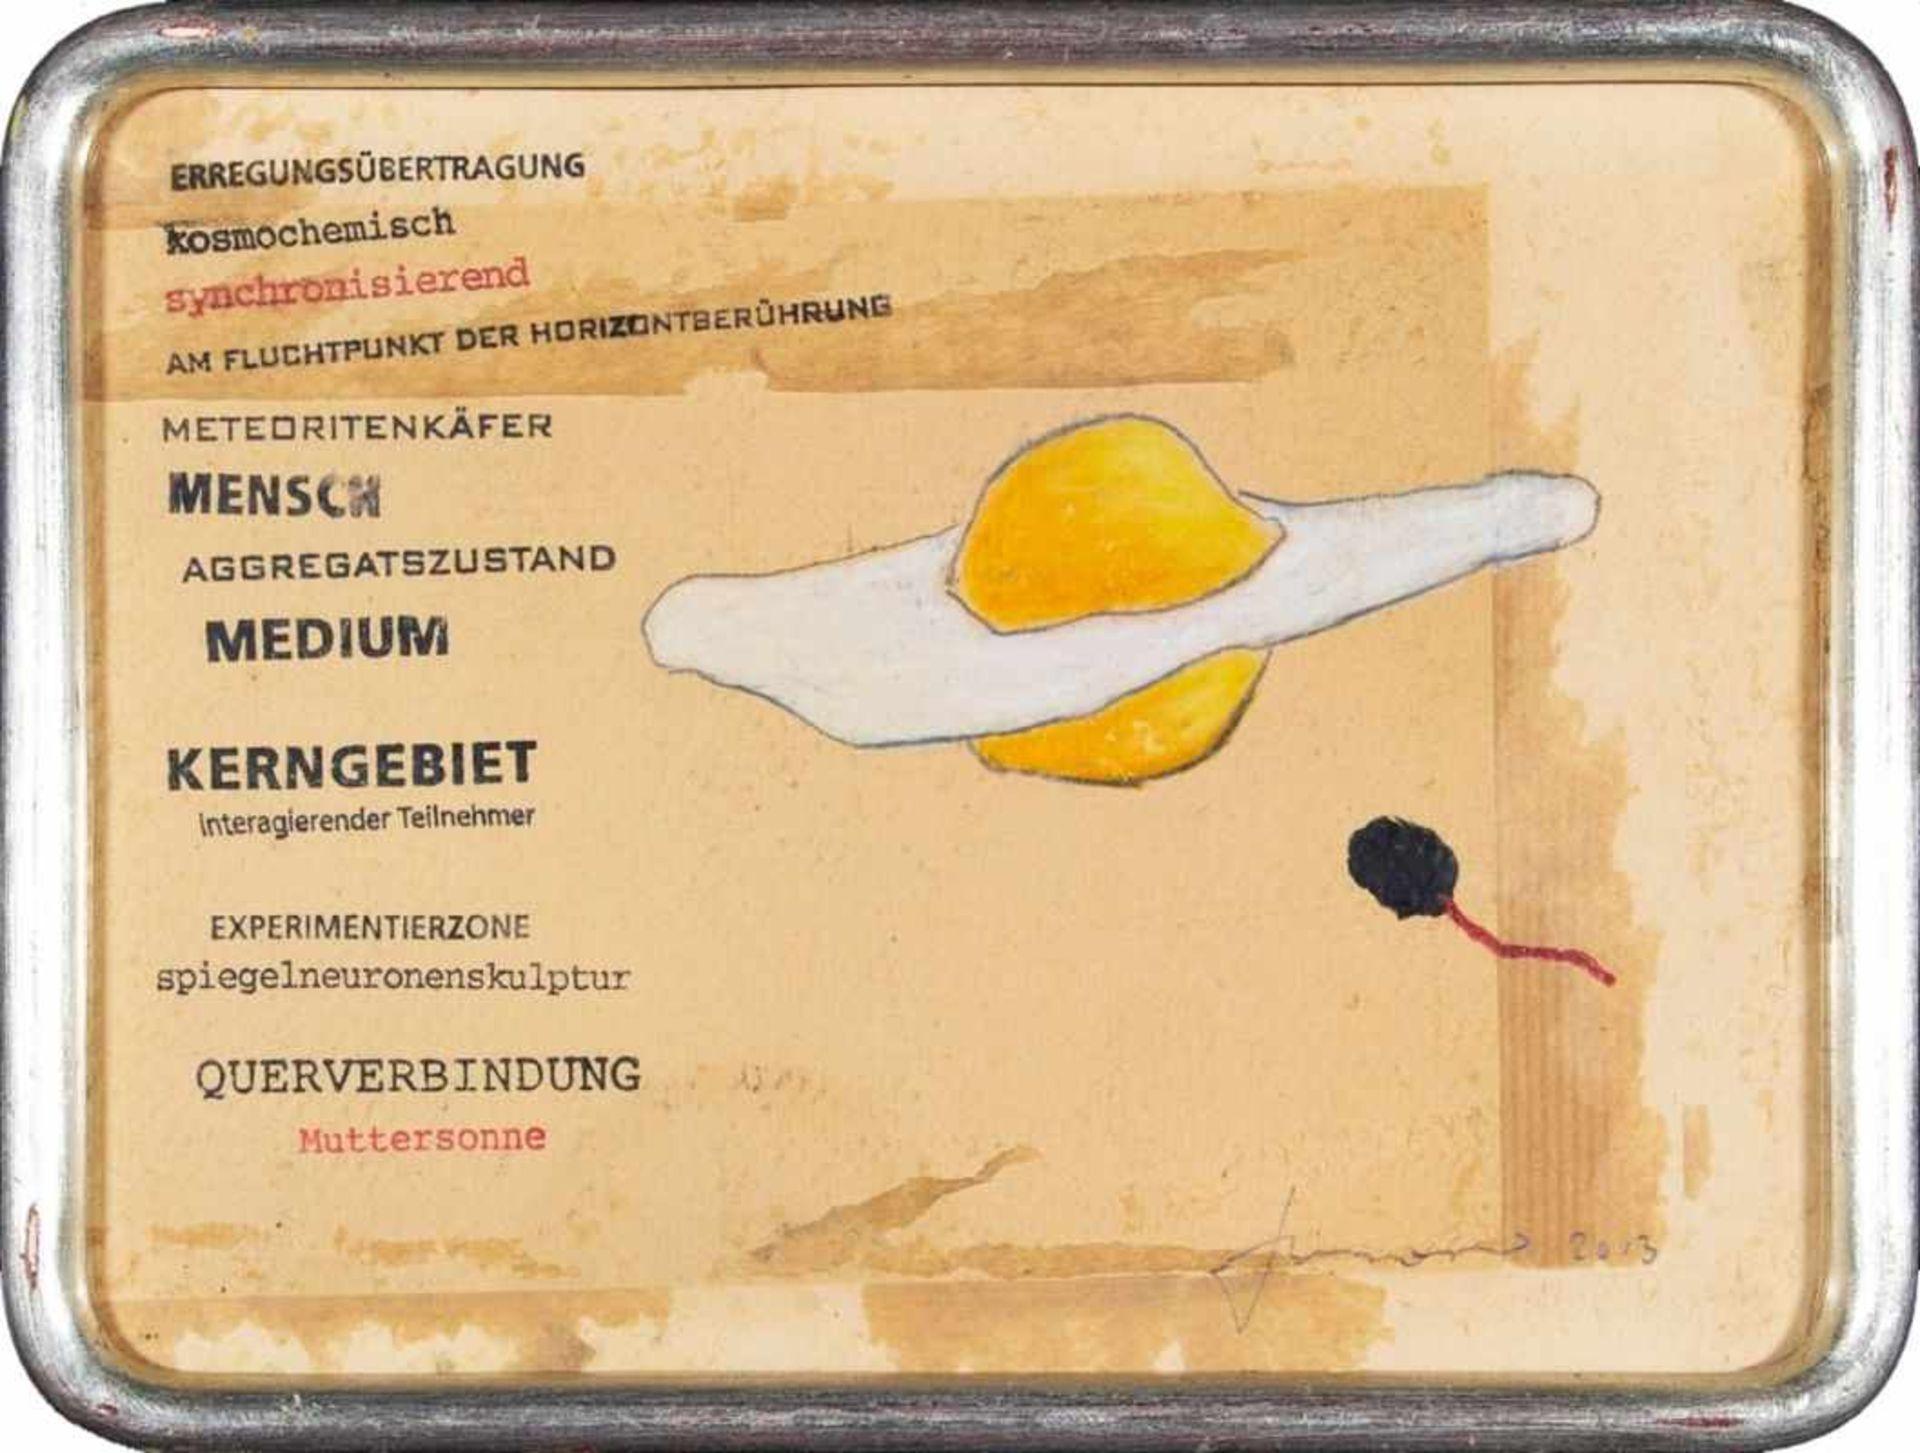 Los 57 - BARBARA ANNA HUSAR(1975 FELDKIRCH)METEORITENDOTTER, 2013Buntstift, Stempel auf Karton, 19,2 x 25,3